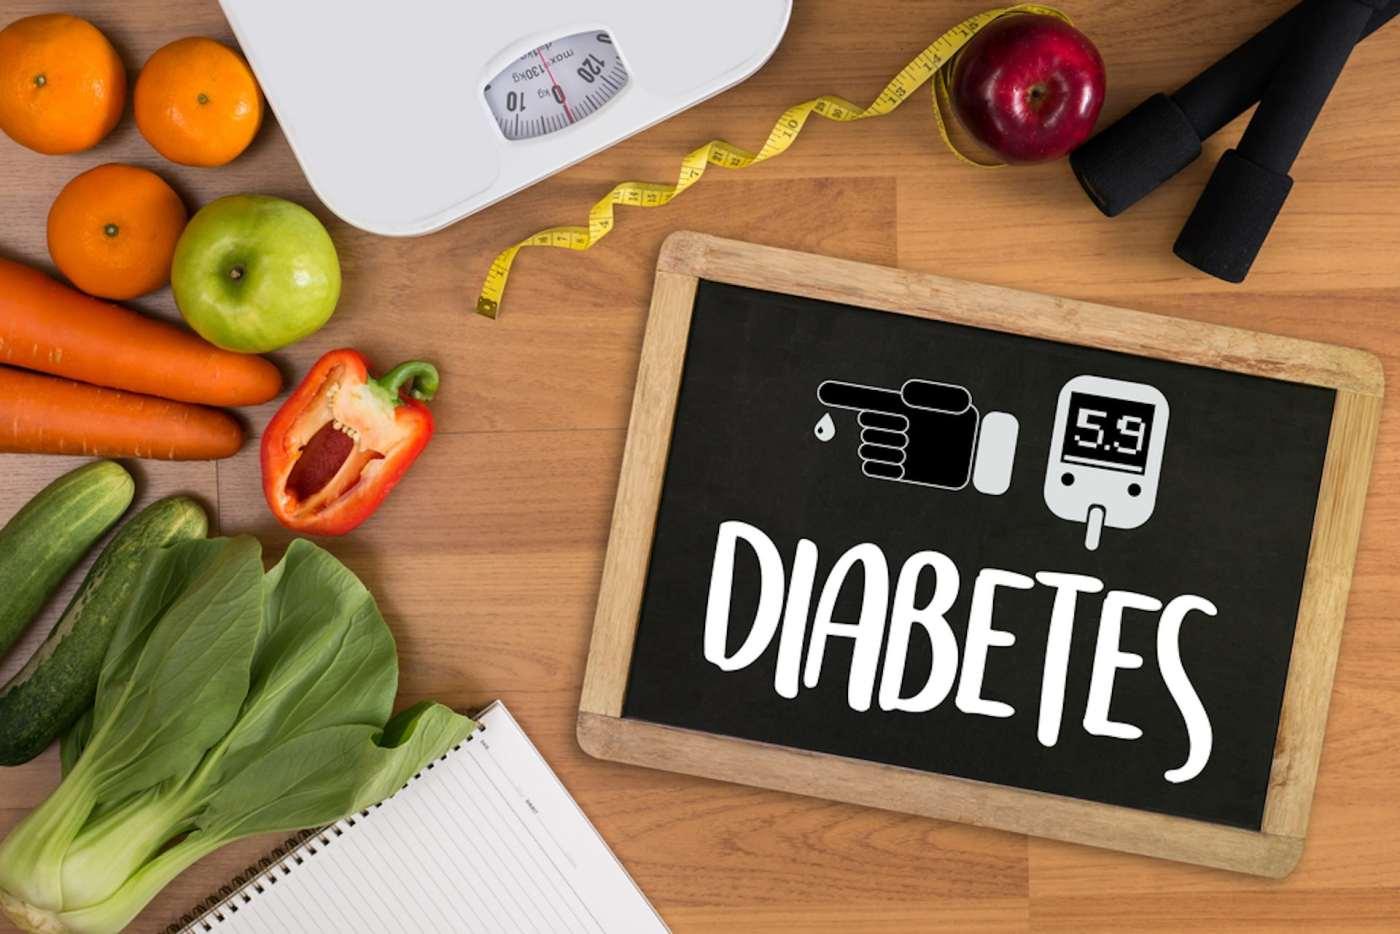 Diabetes test and fruit image